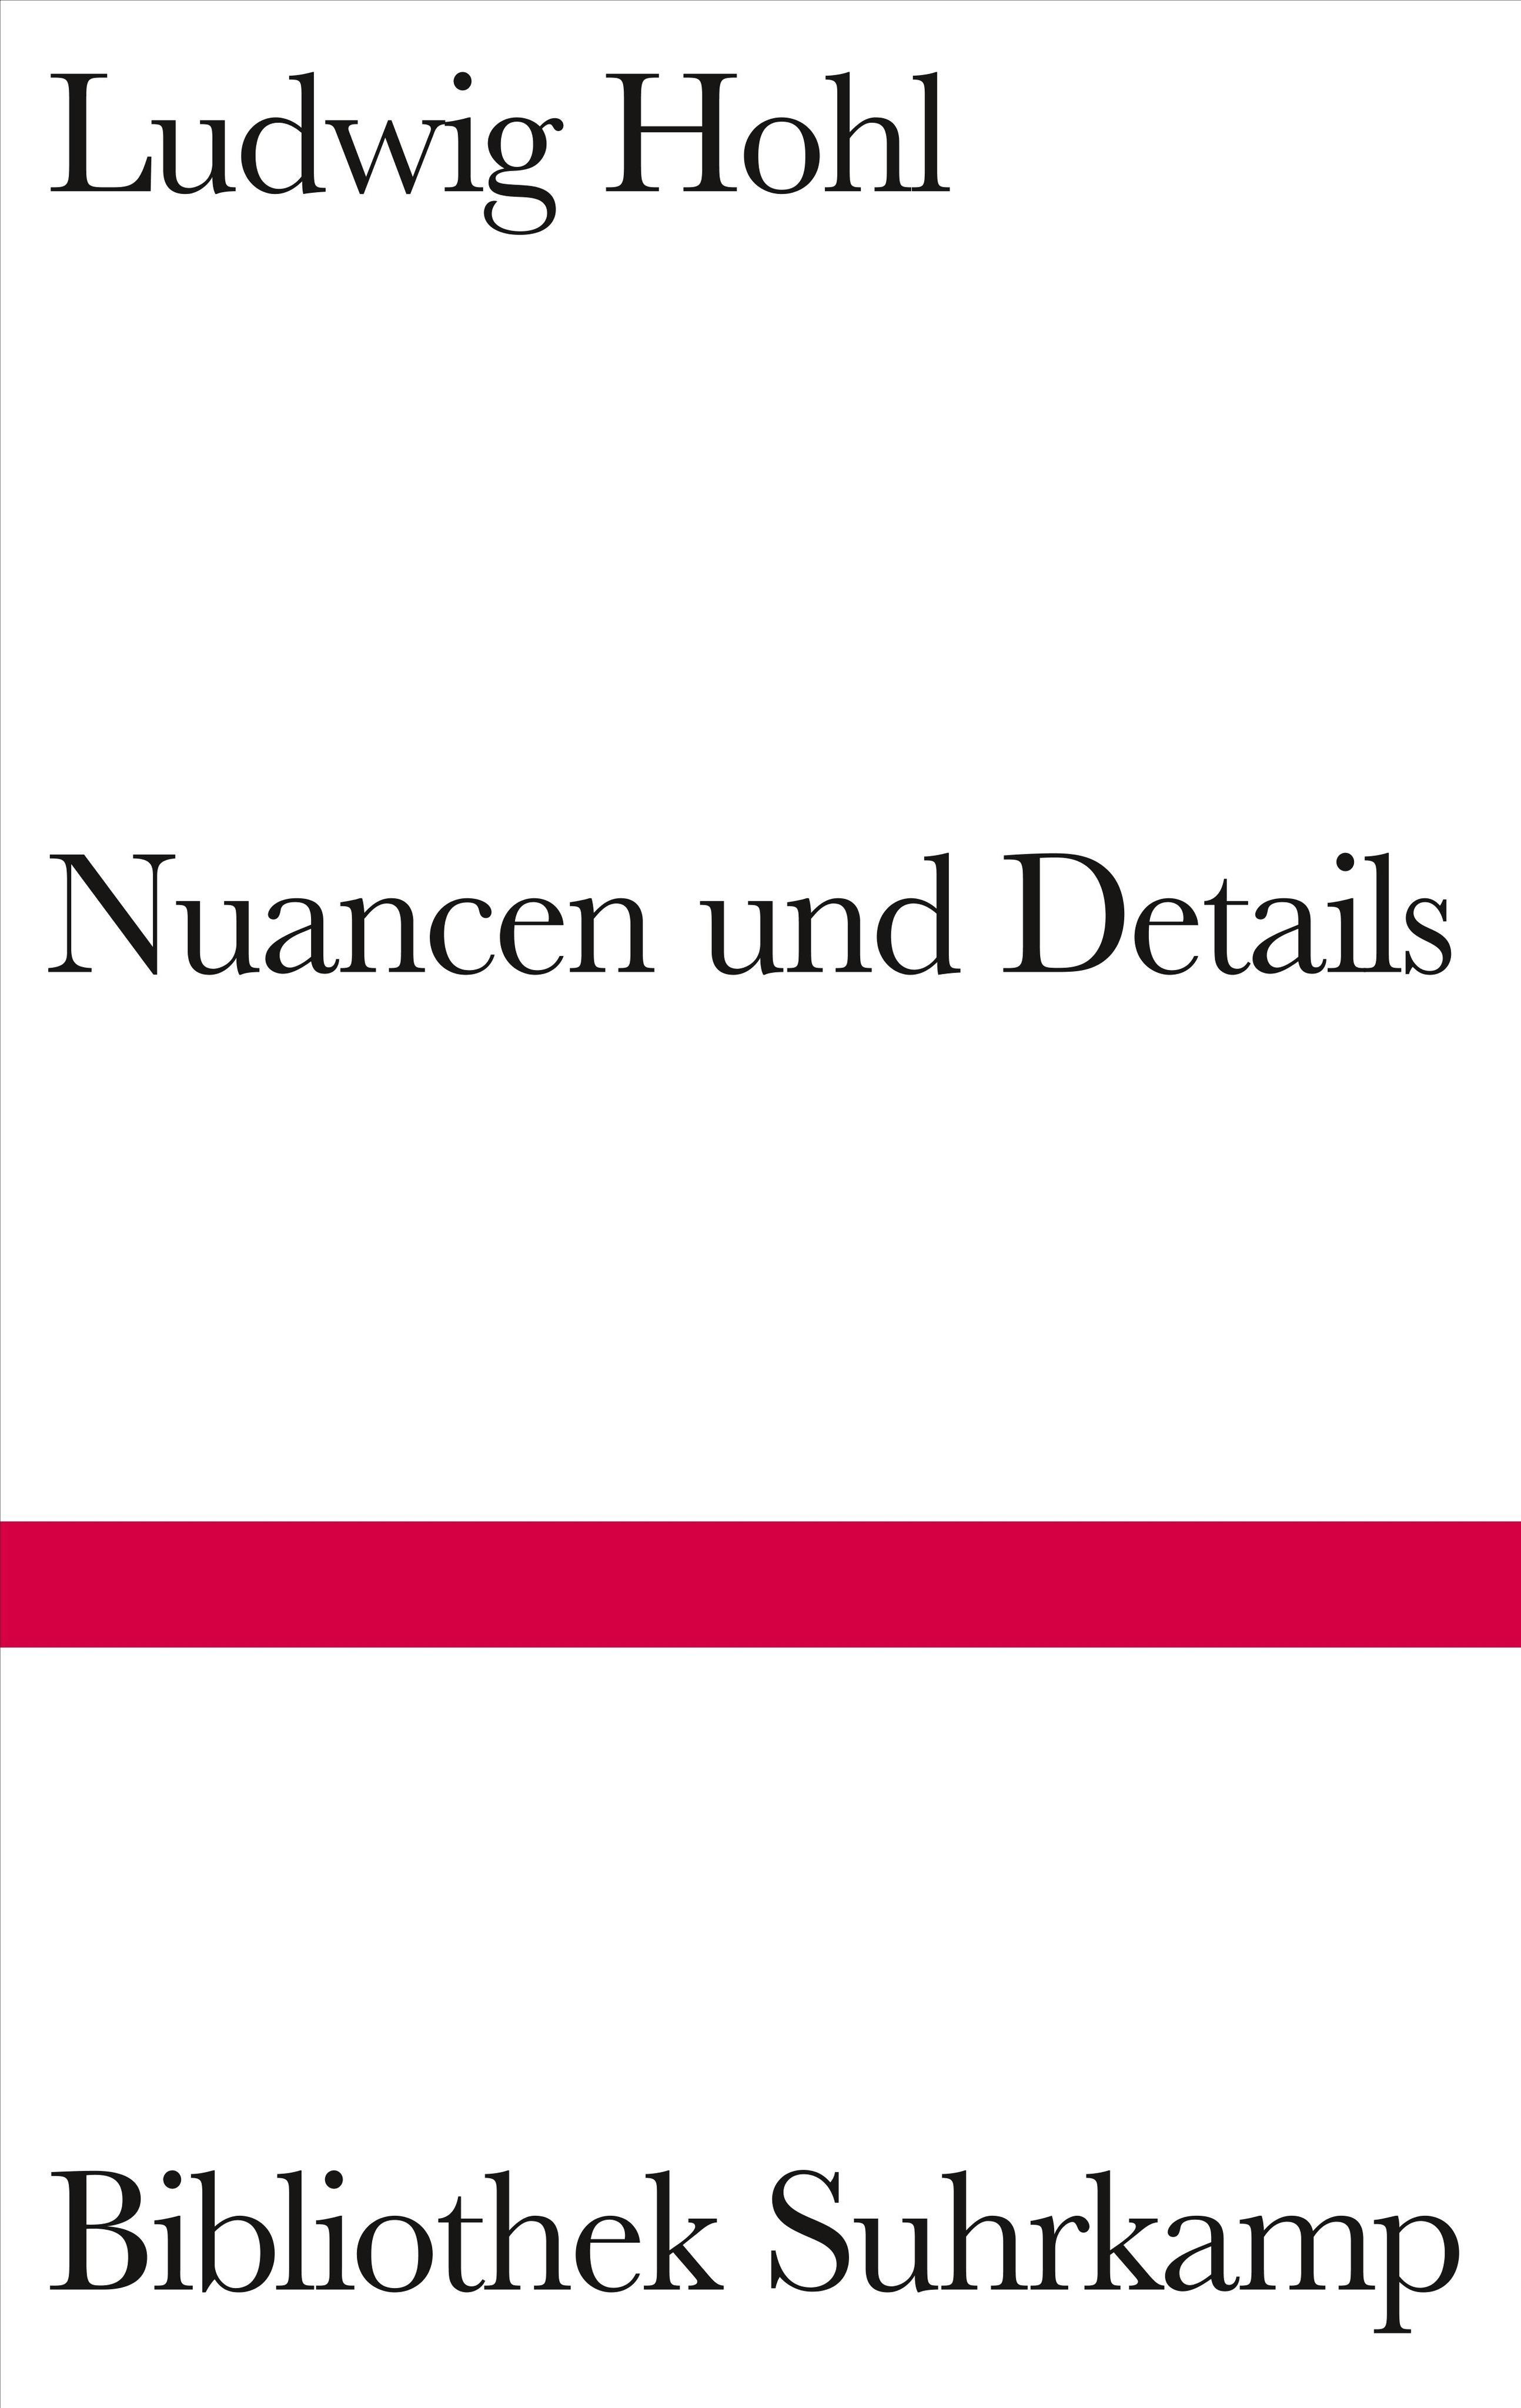 Nuancen und Details Ludwig Hohl 9783518224854